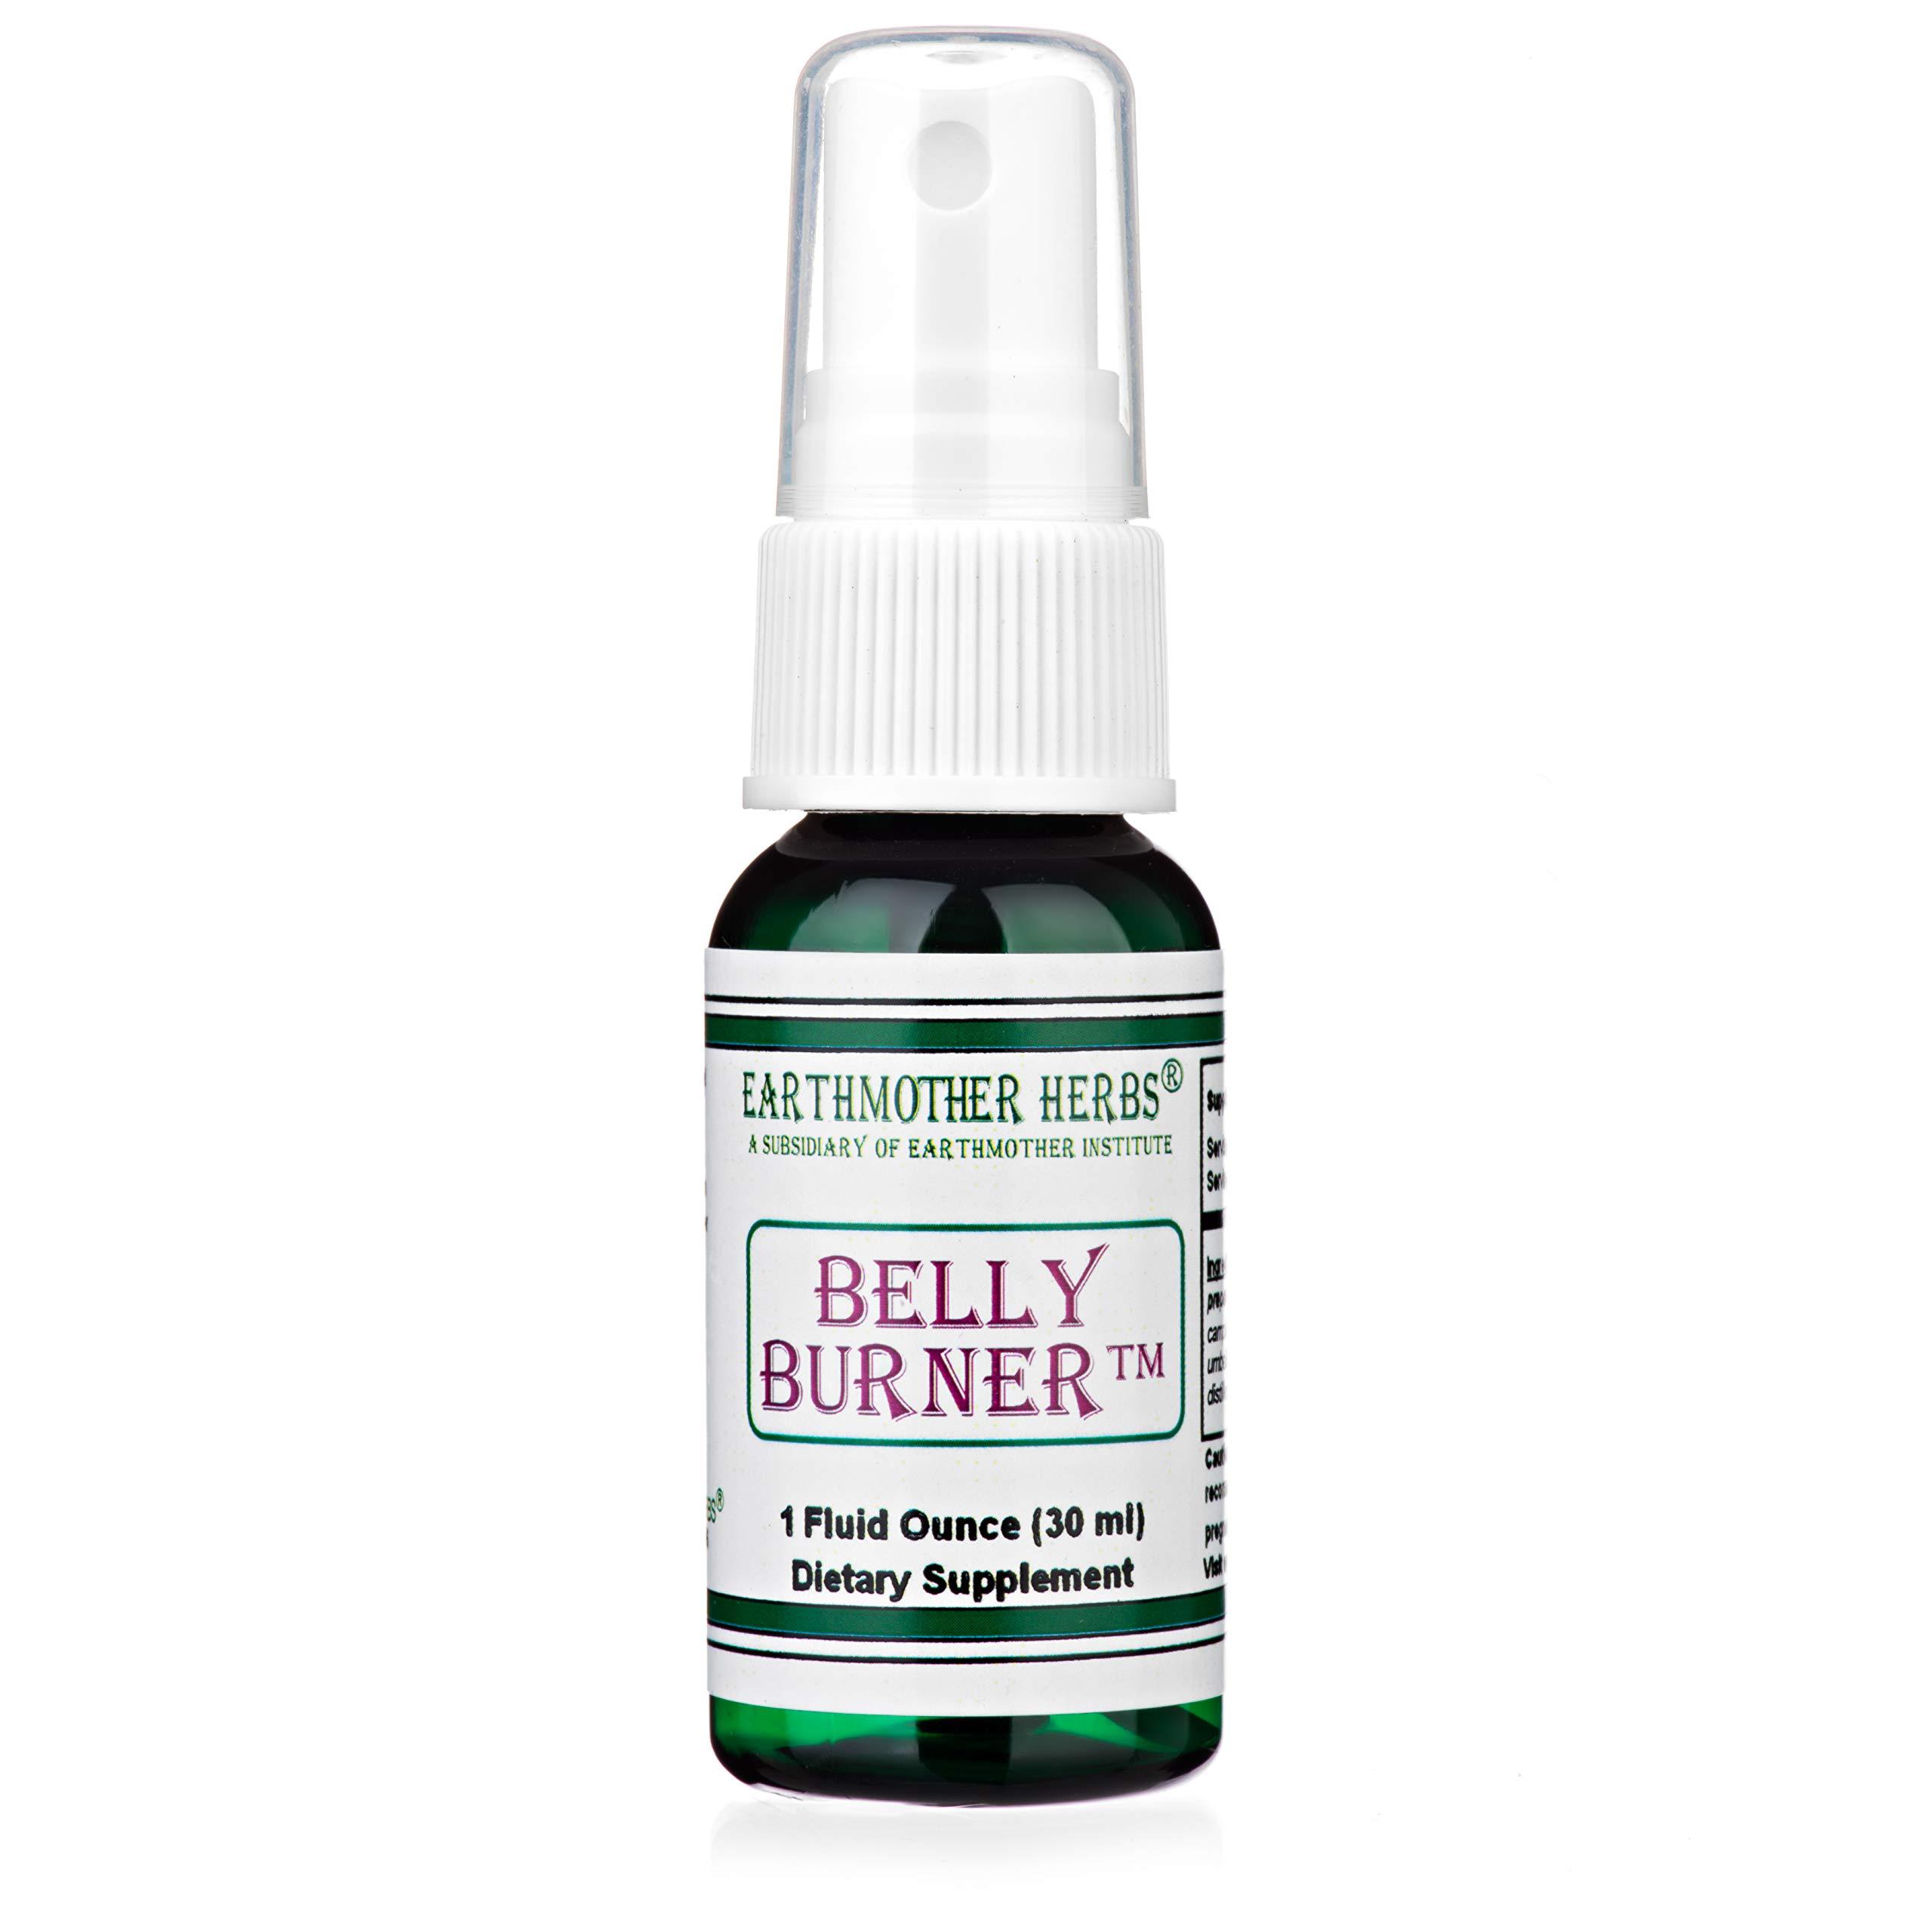 Earthmother Herbs Belly Burner